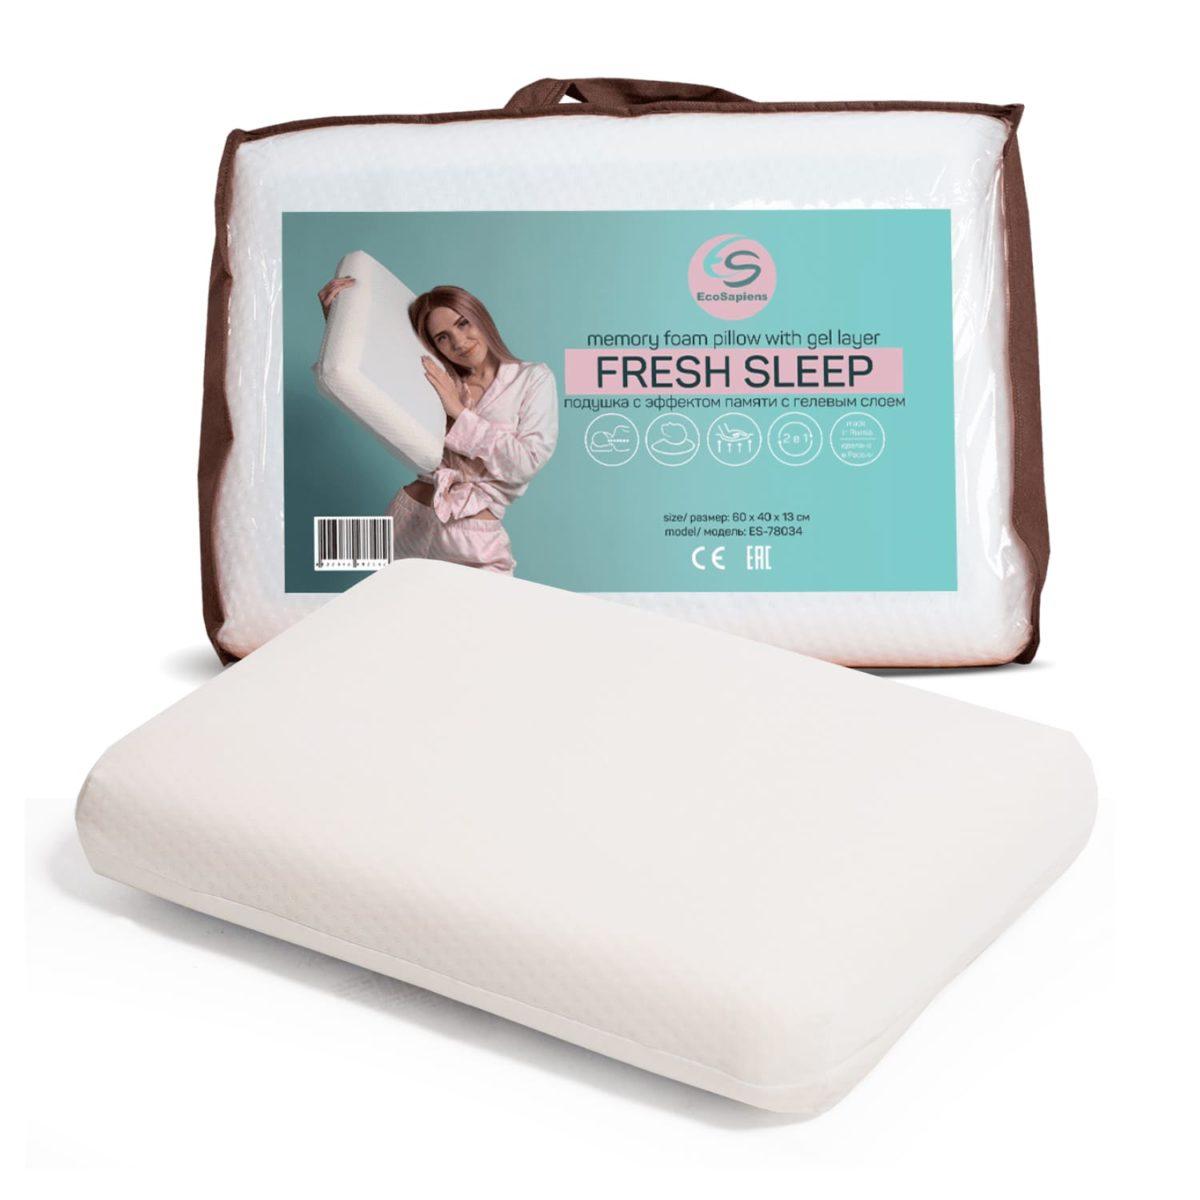 Freshsleep 7